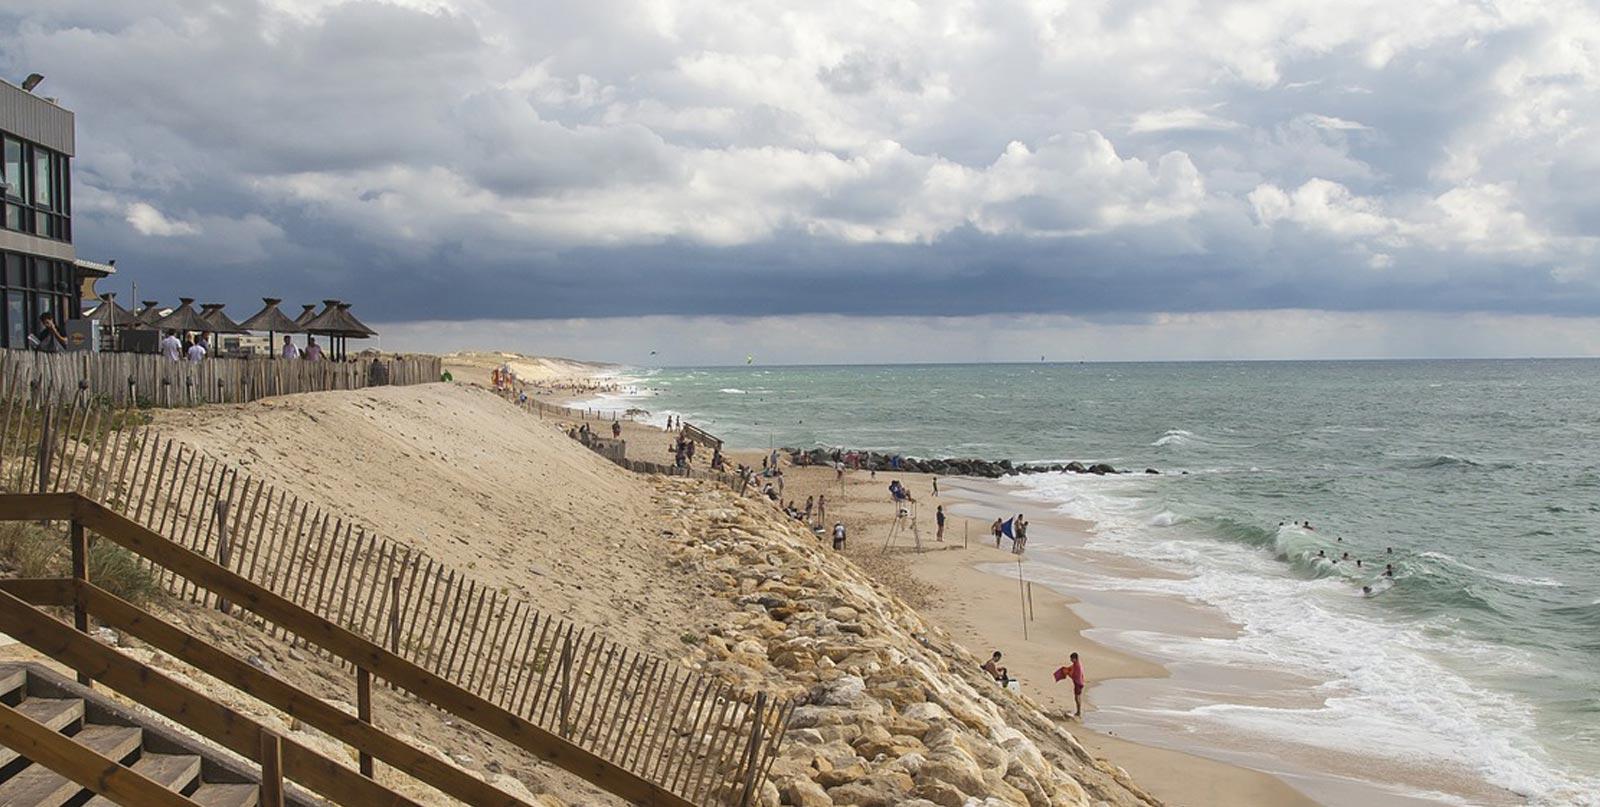 Lacanau la plage n'existe presque plus - ancorim